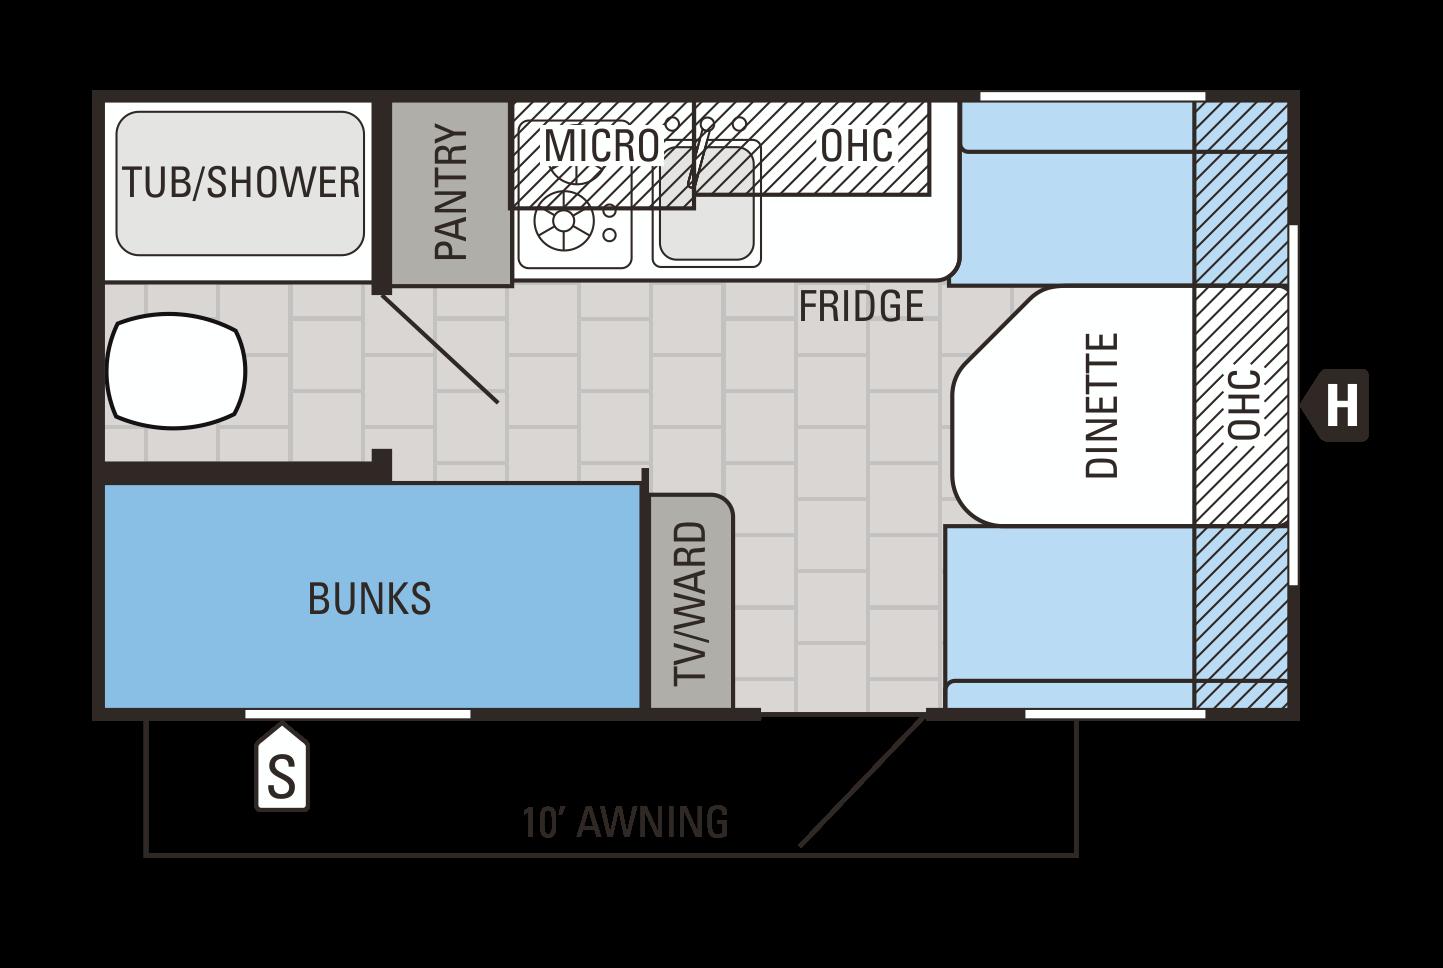 154BH Floorplan